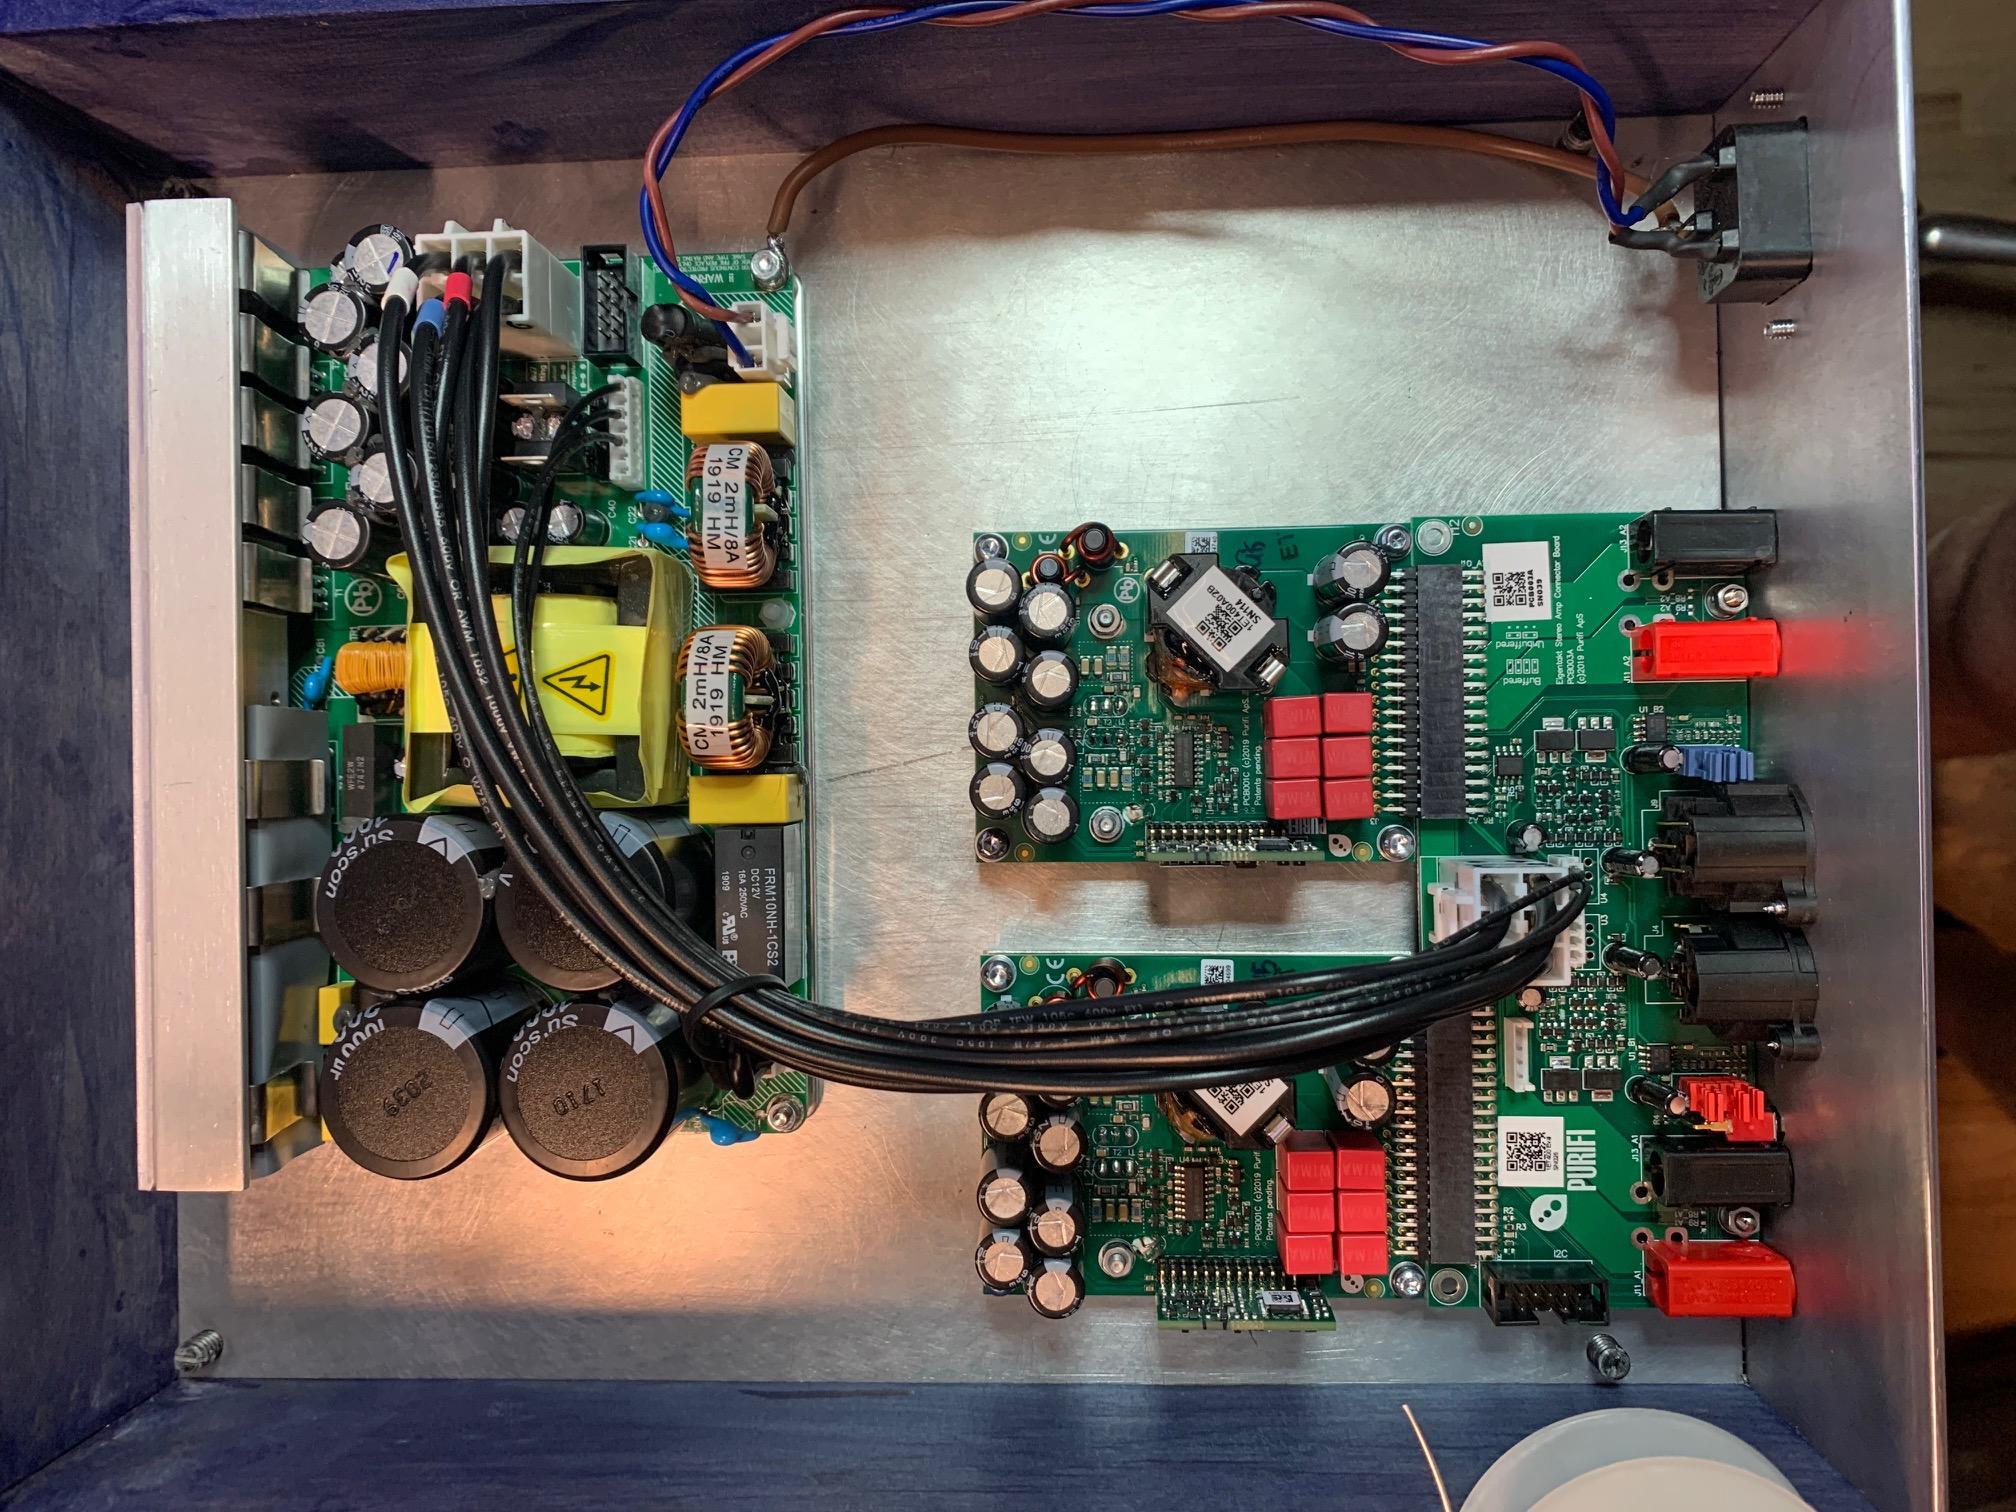 Amplificador de Potencia, Ajuda Precisa-se - Página 3 804809d1577412540-brainstorming-purifi-1et400a-amps-img_5277-jpg